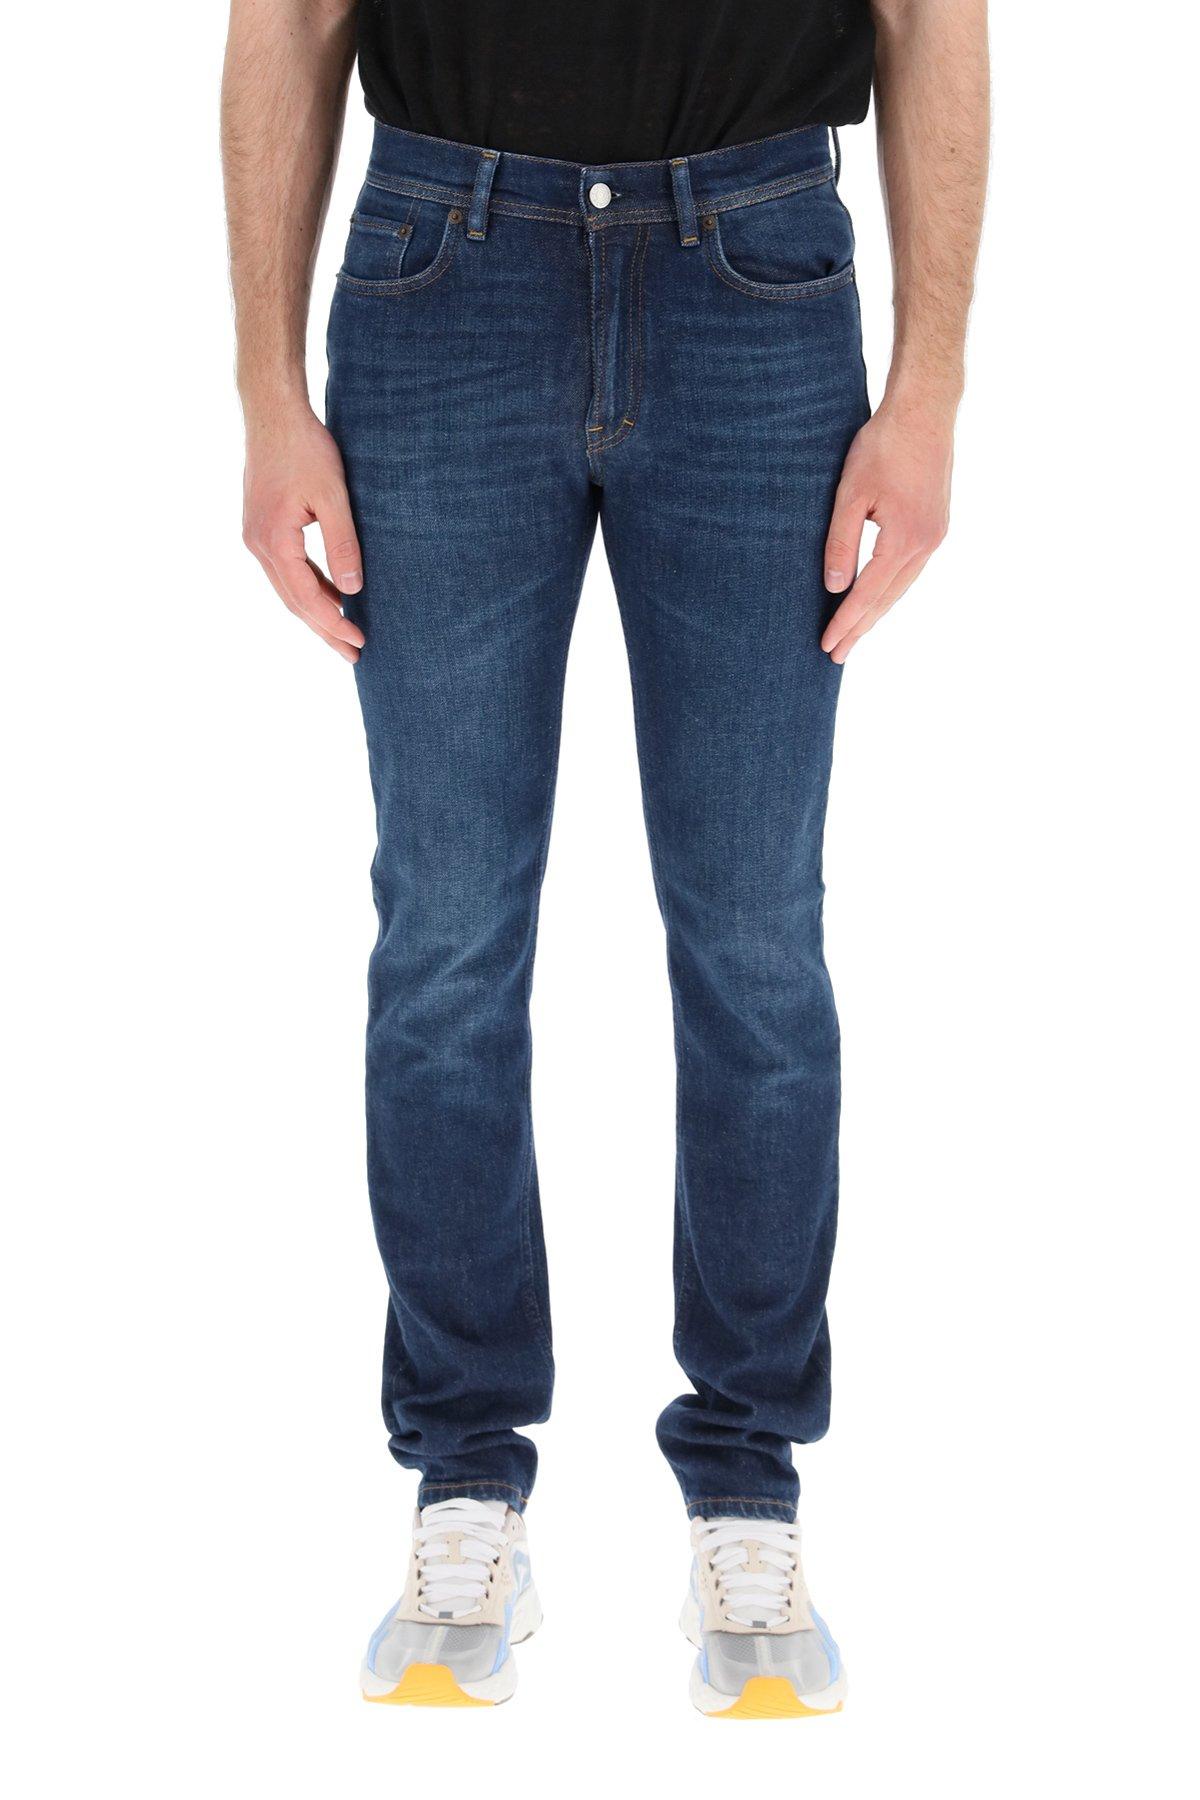 Acne studios jeans north slim